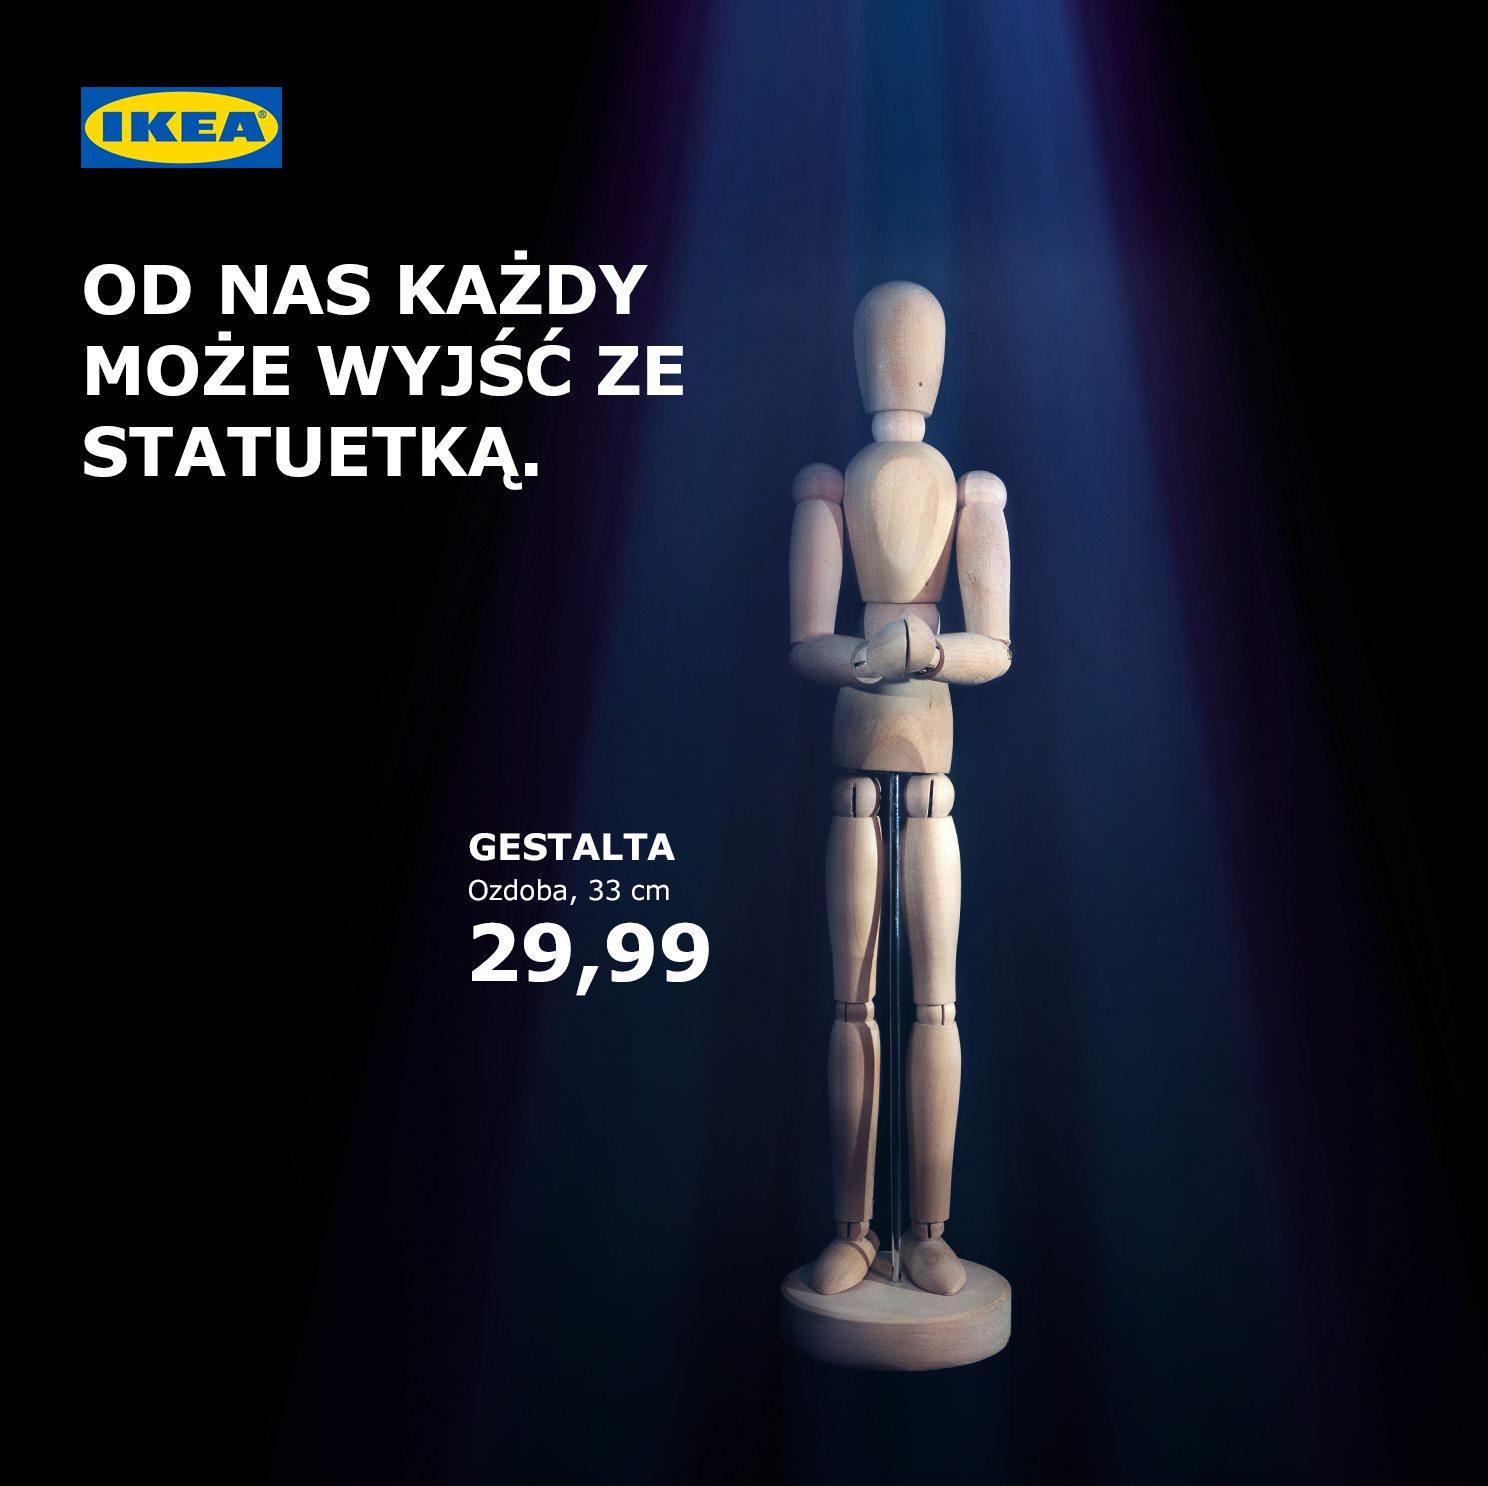 Ikea real time marketing